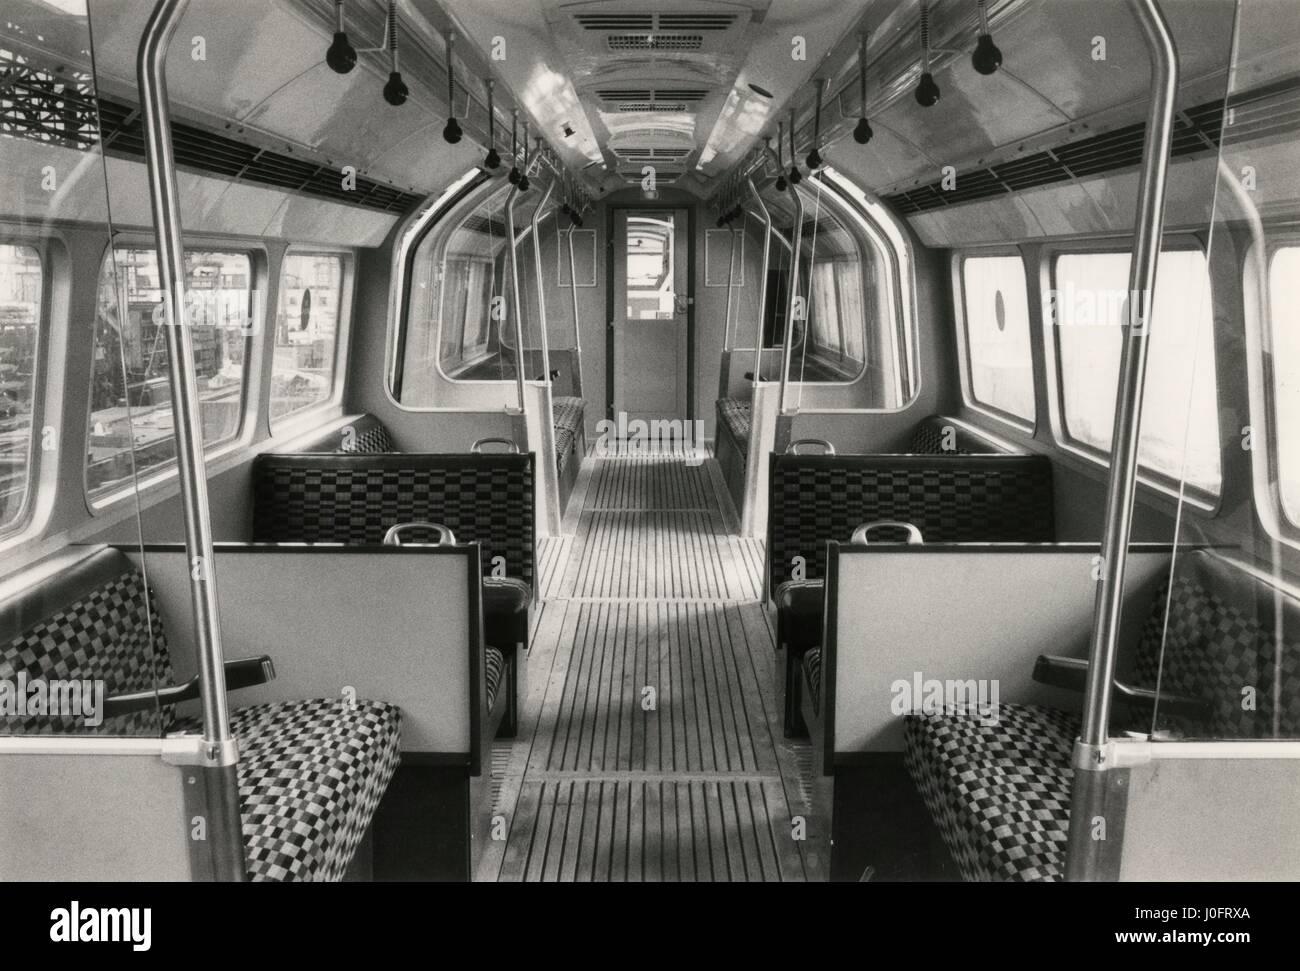 Londoner U-Bahn Wagen Innenraum Stockfoto